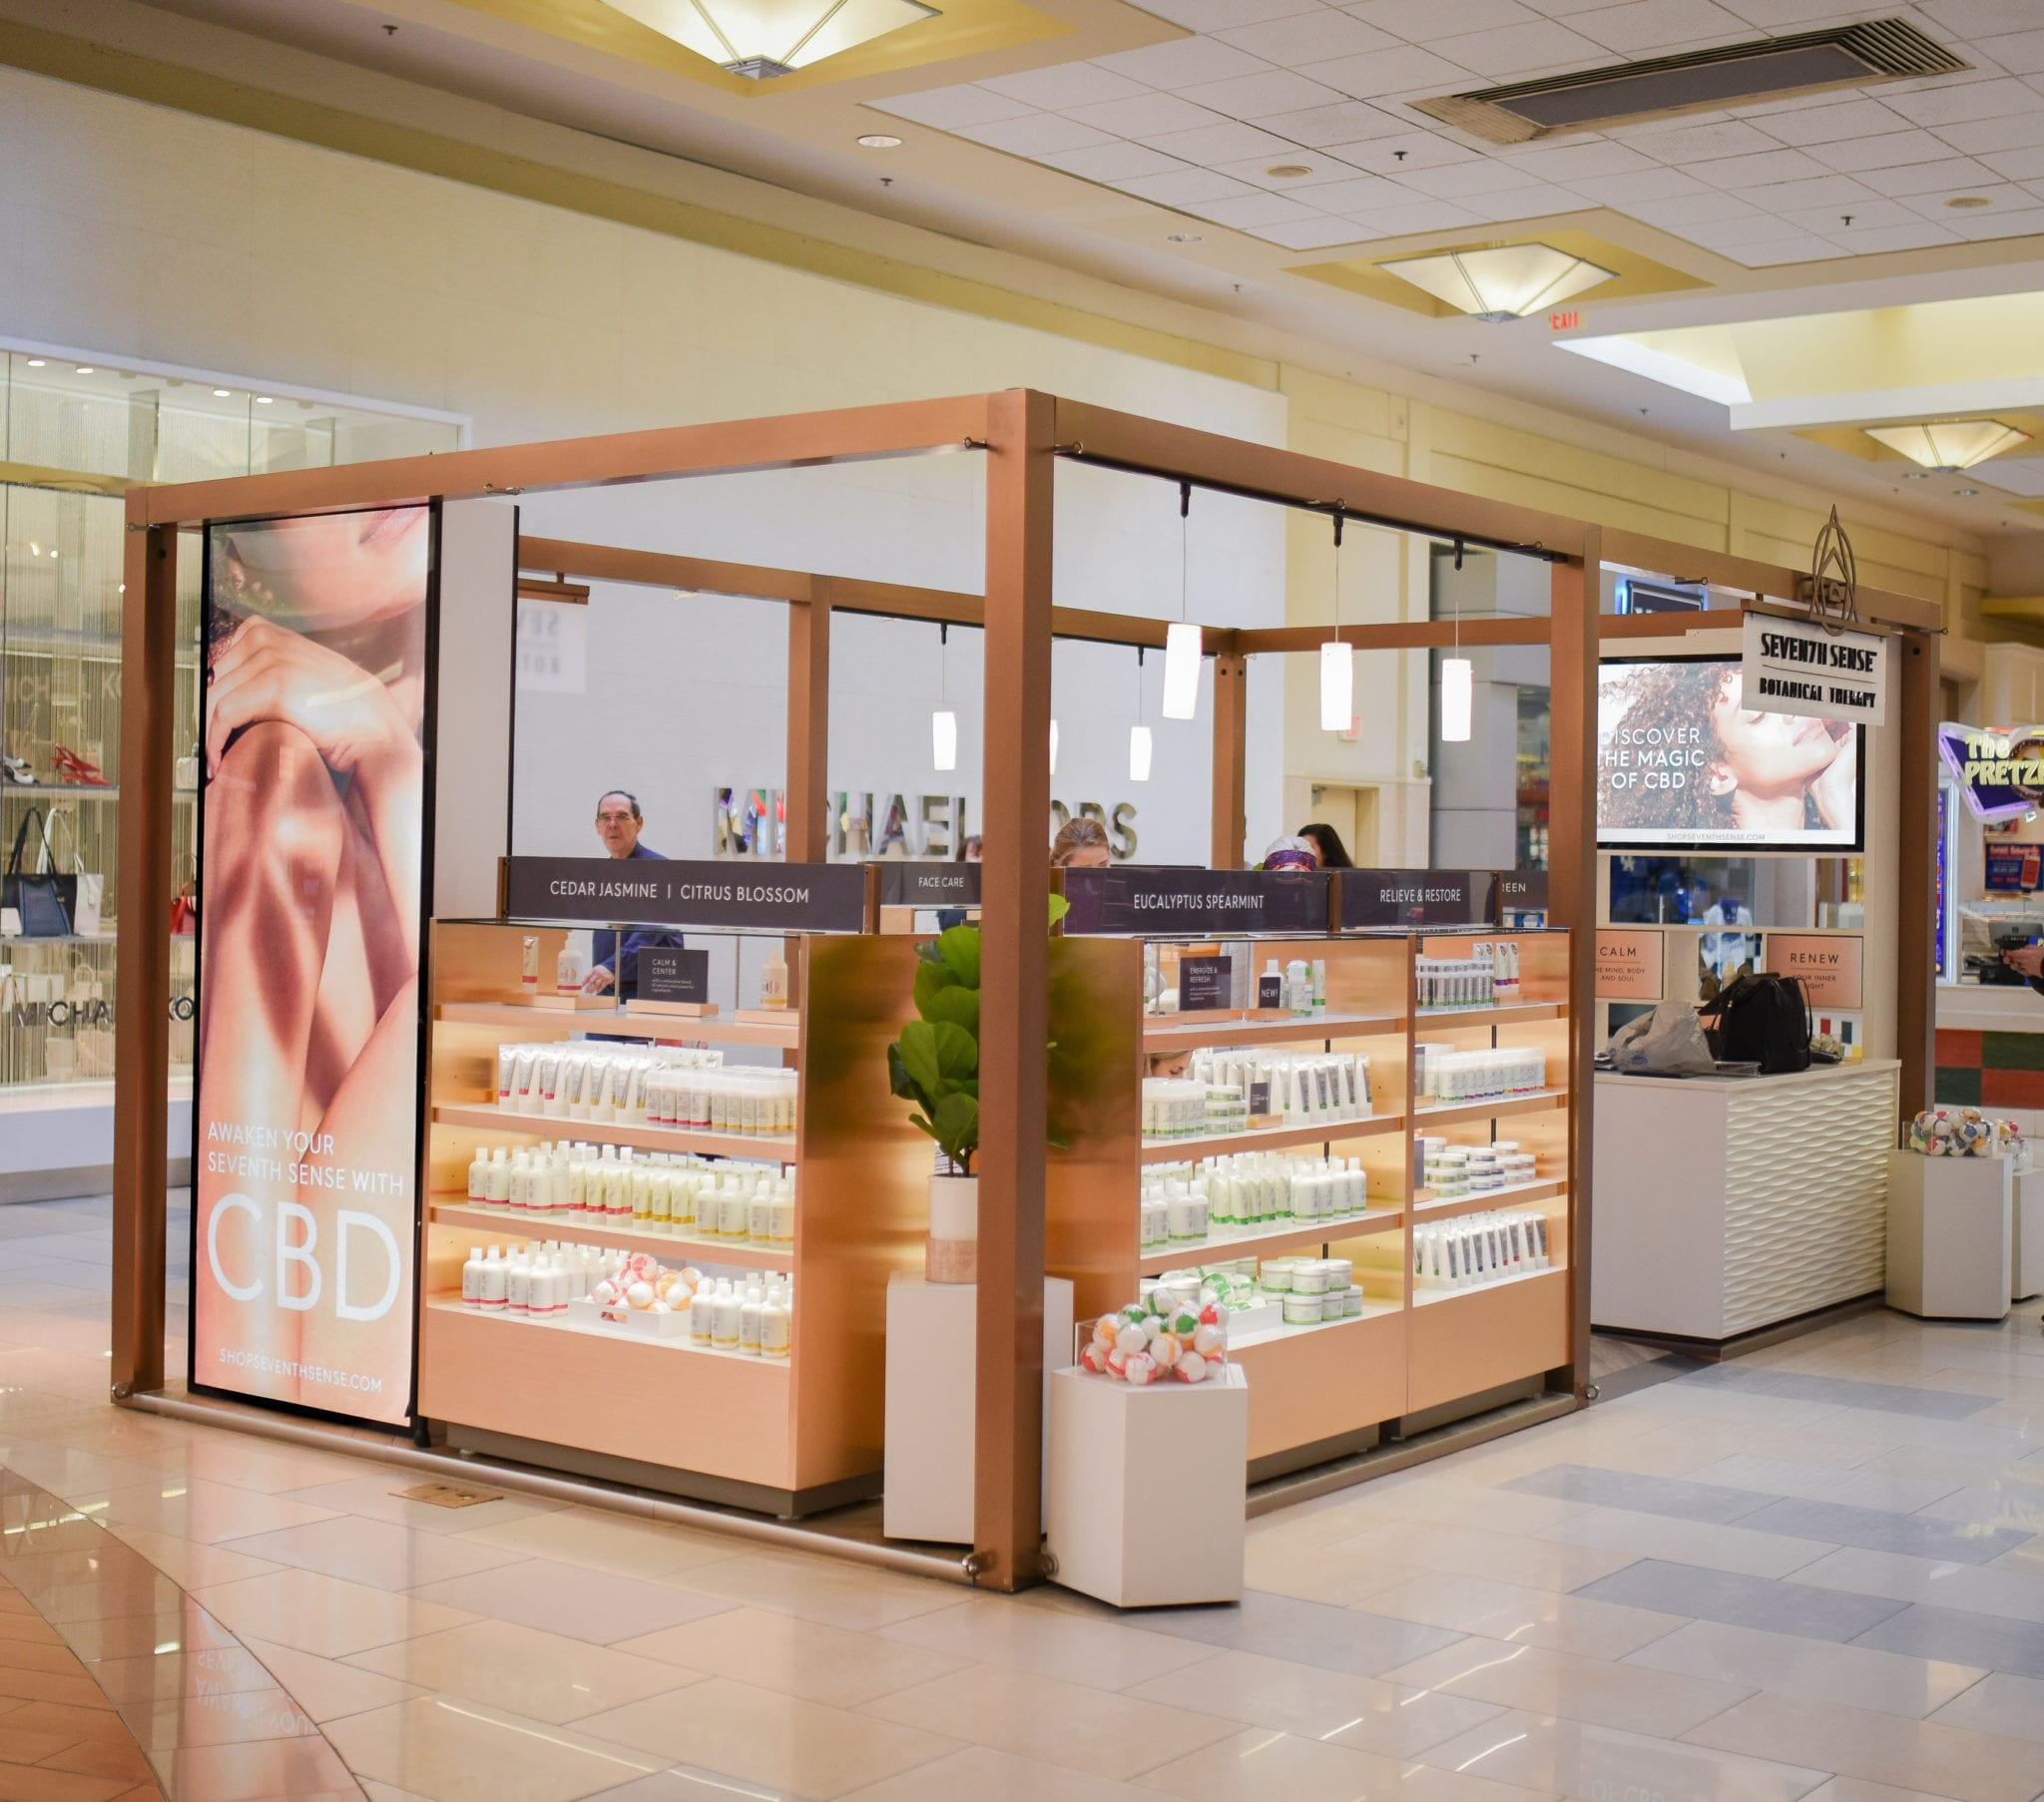 Green Growth CEO steps down, company closes CBD mall kiosks